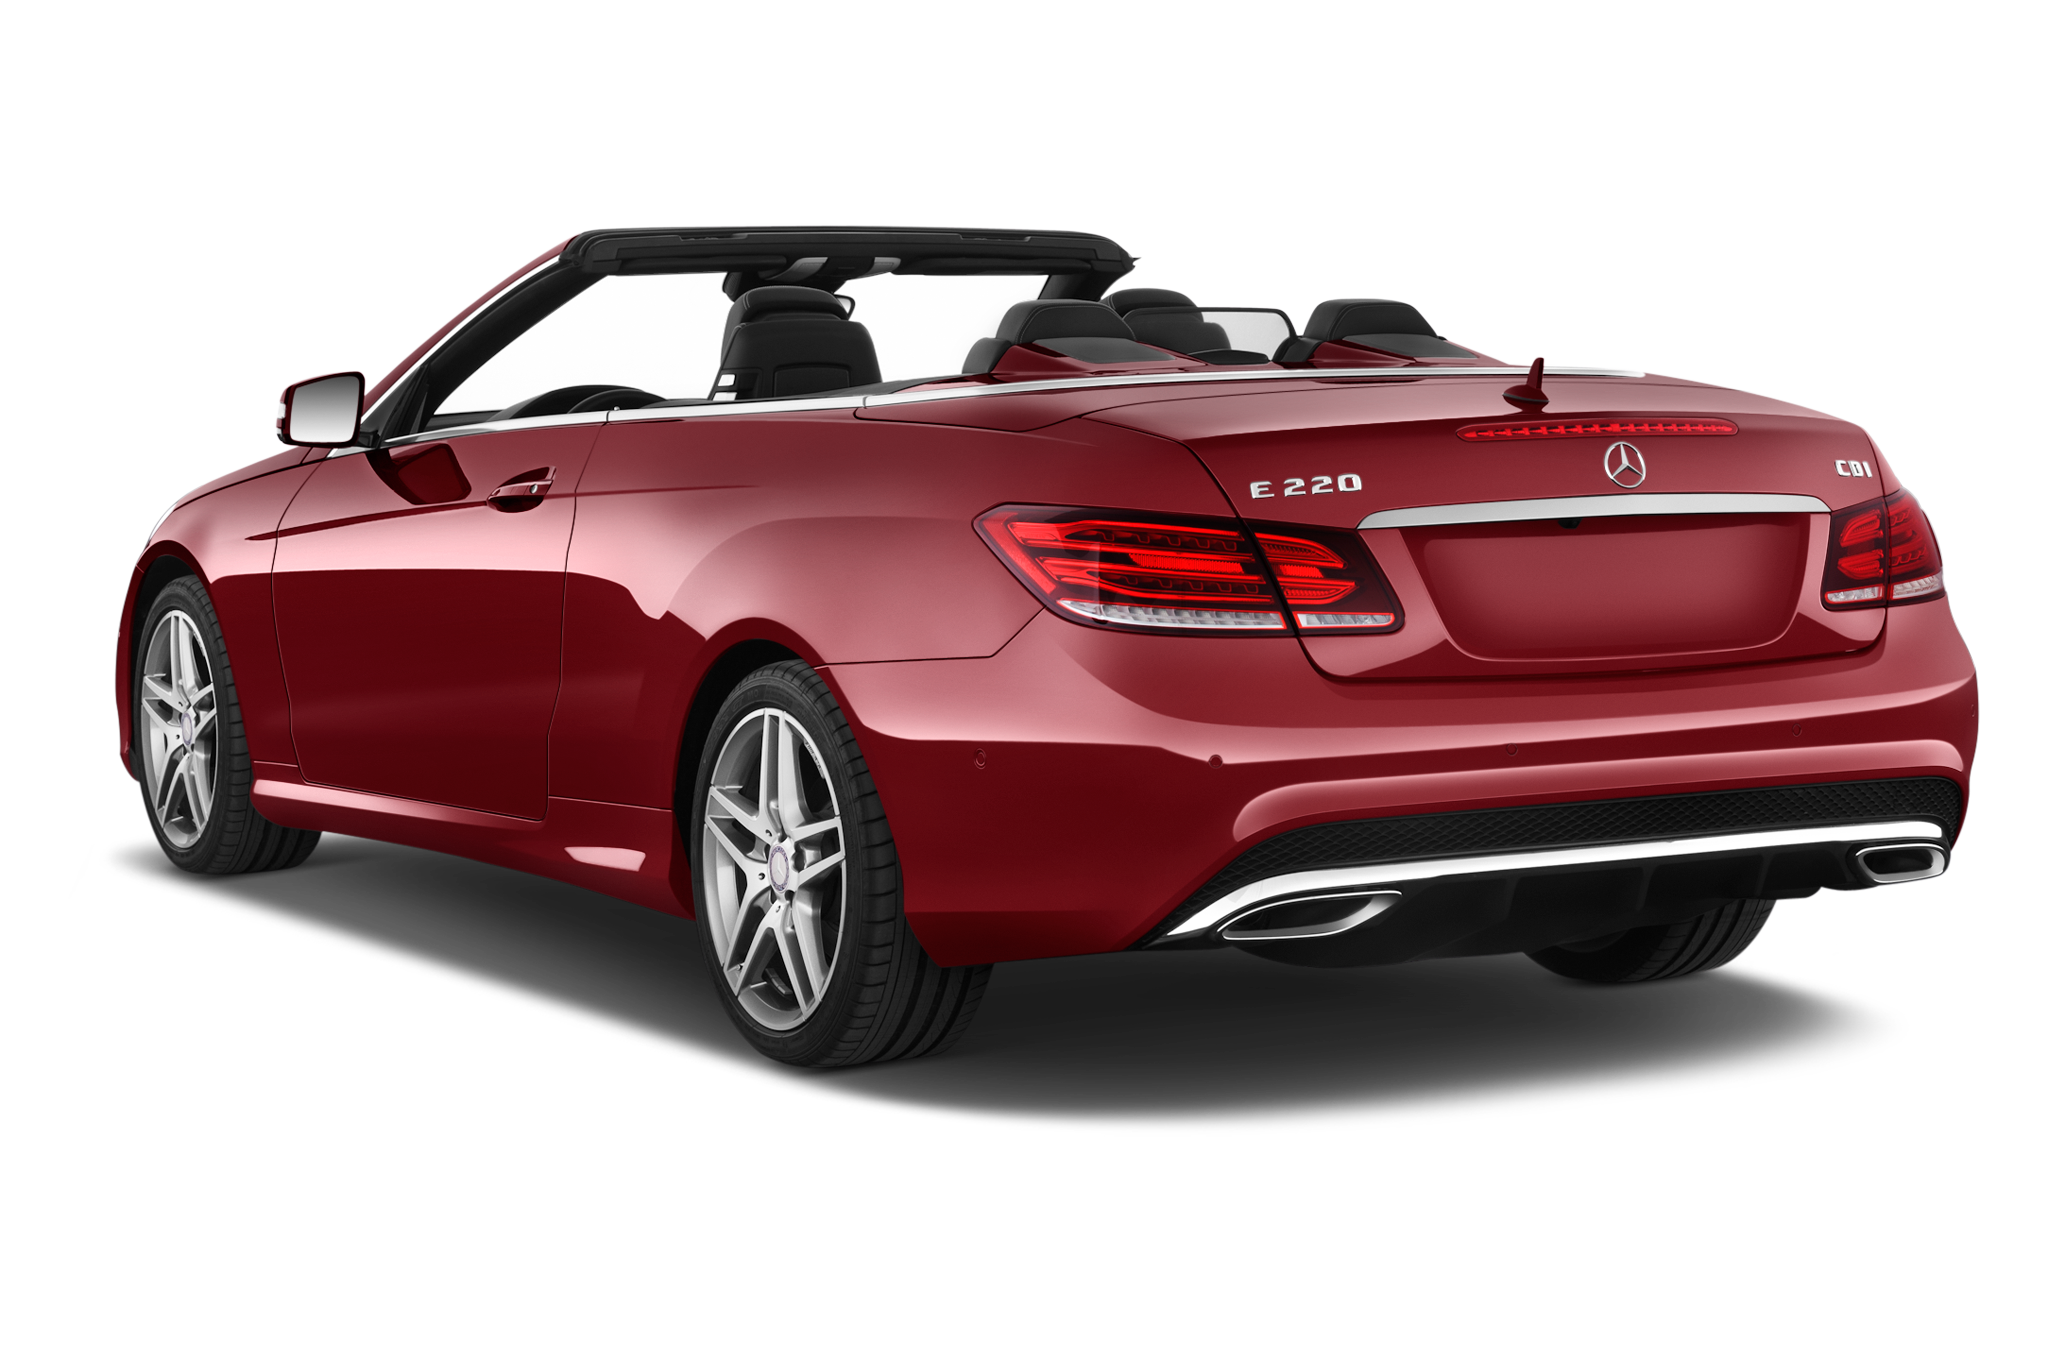 cabriolet car convertible side benz reviews top gear mercedes class e